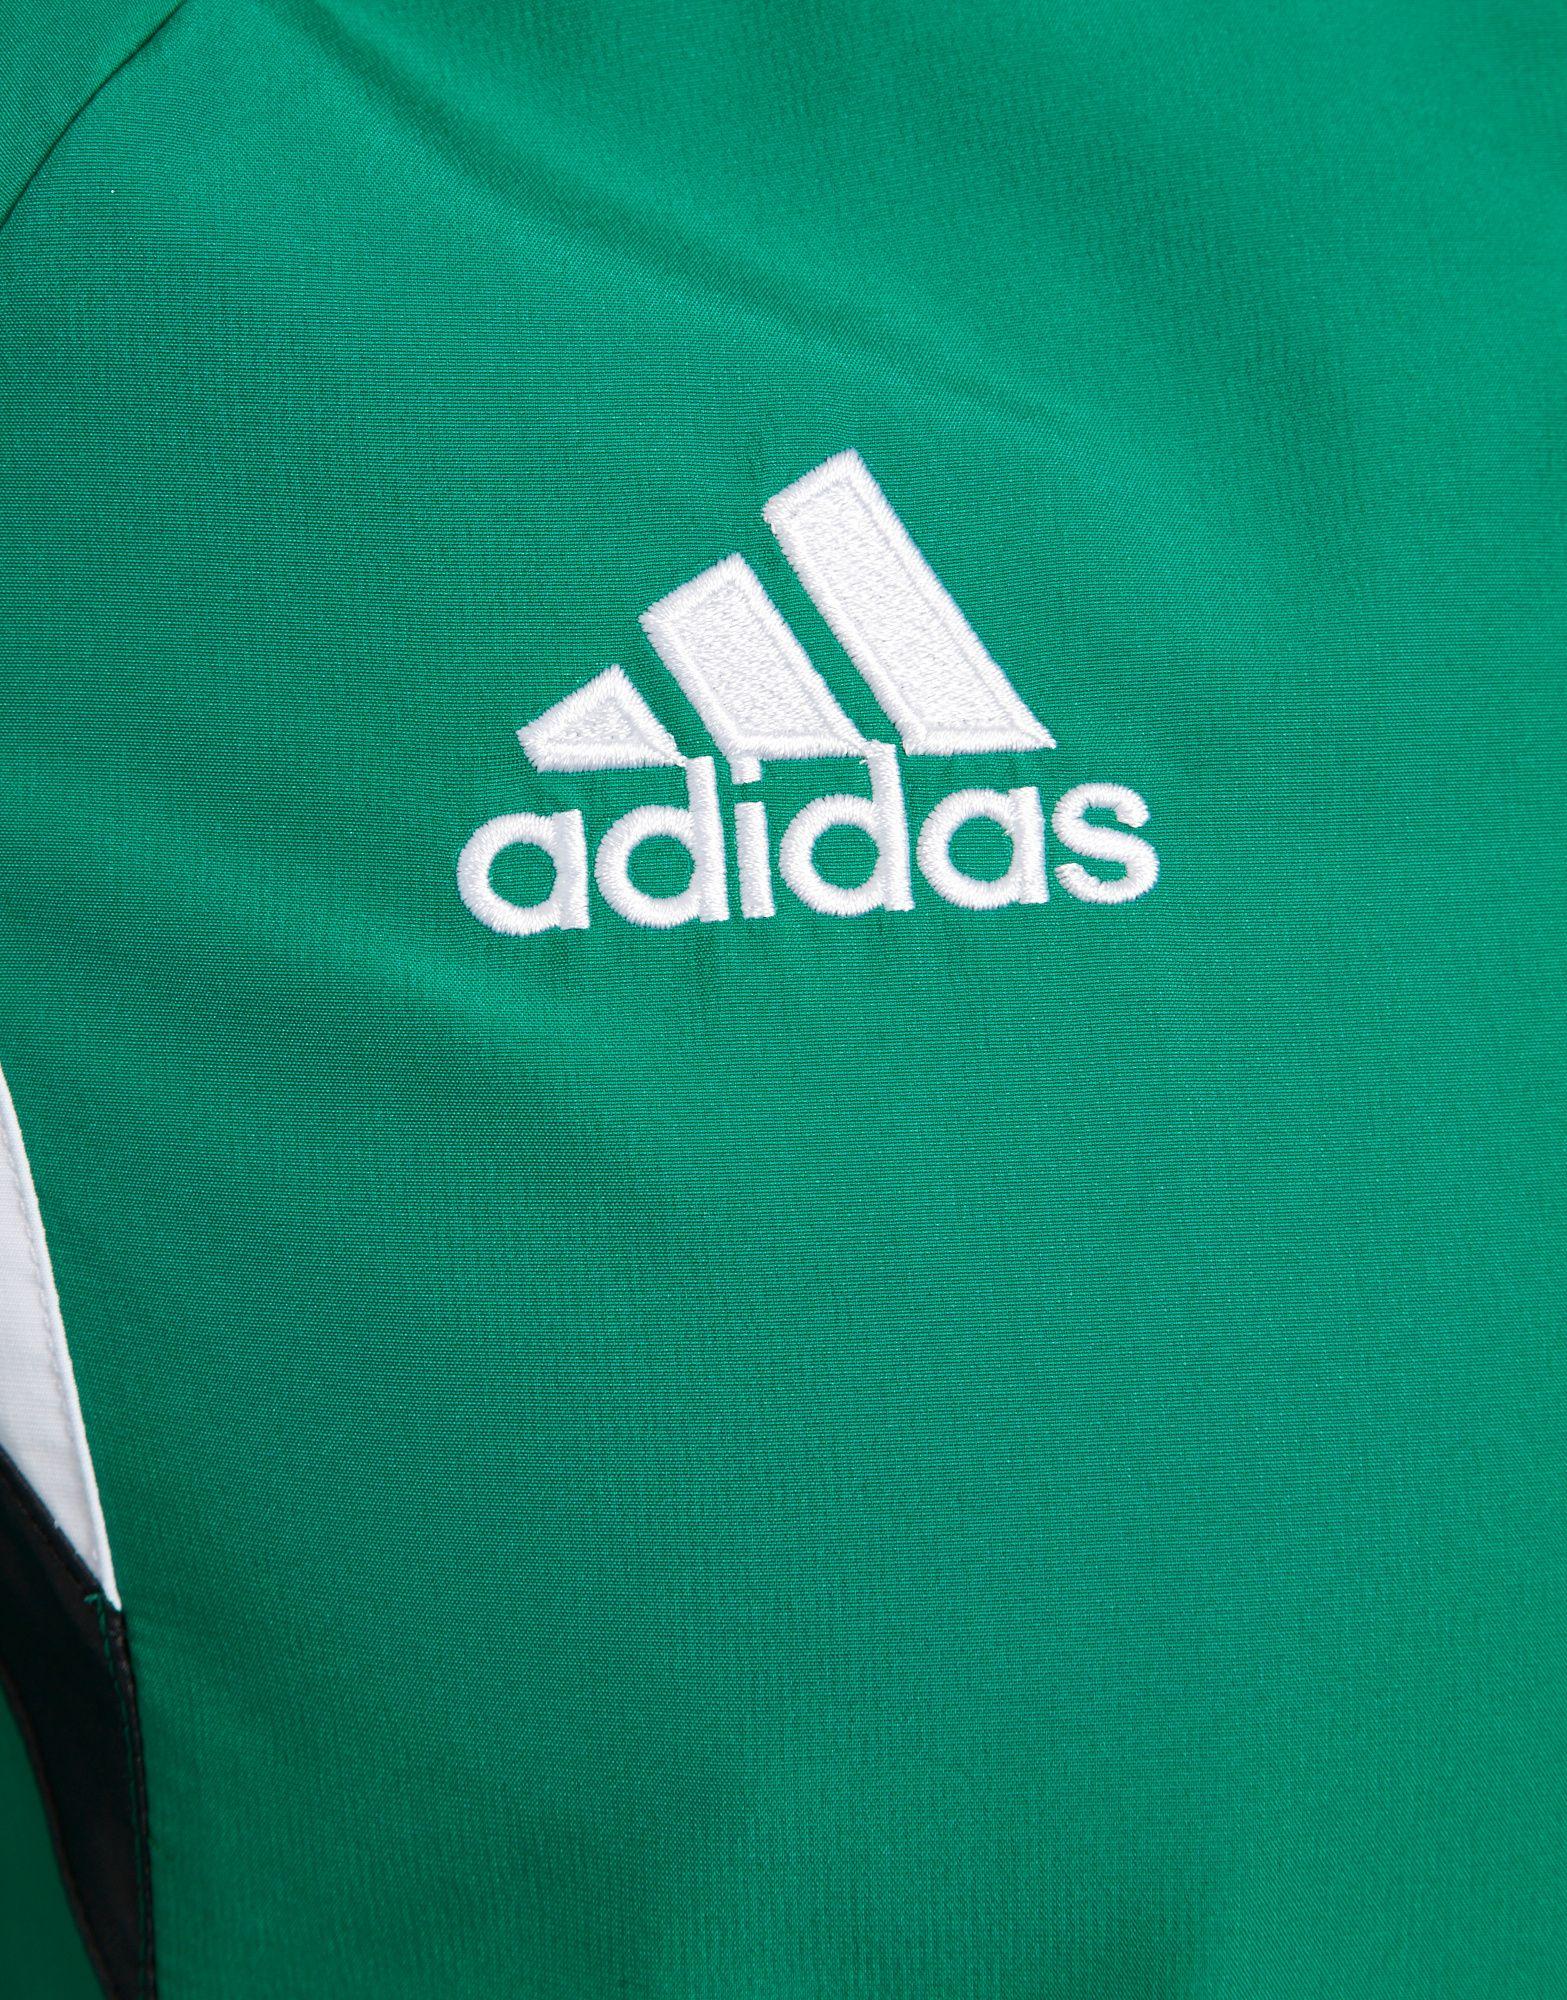 adidas Northern Ireland Press Suit